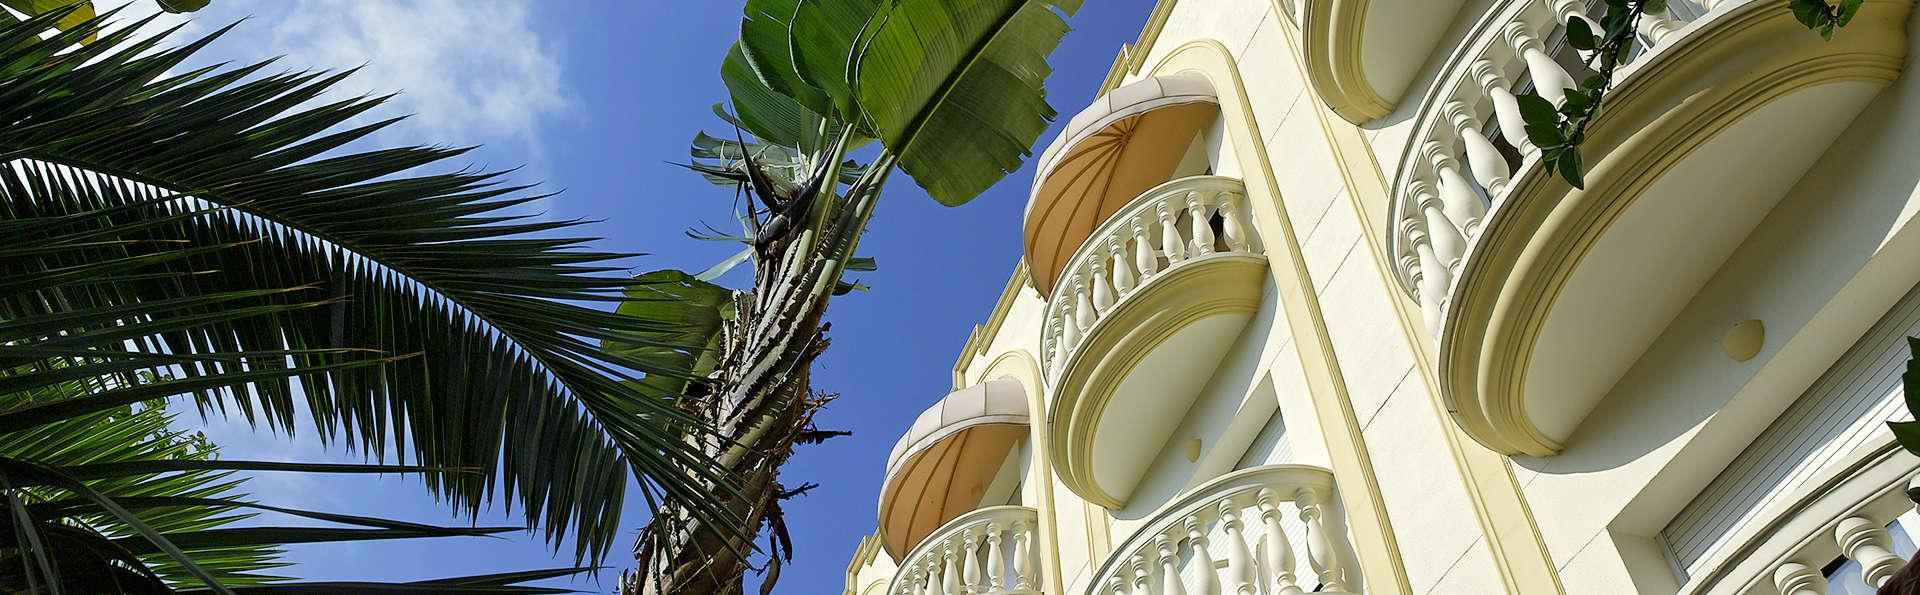 URH Sitges Playa - EDIT_front.jpg